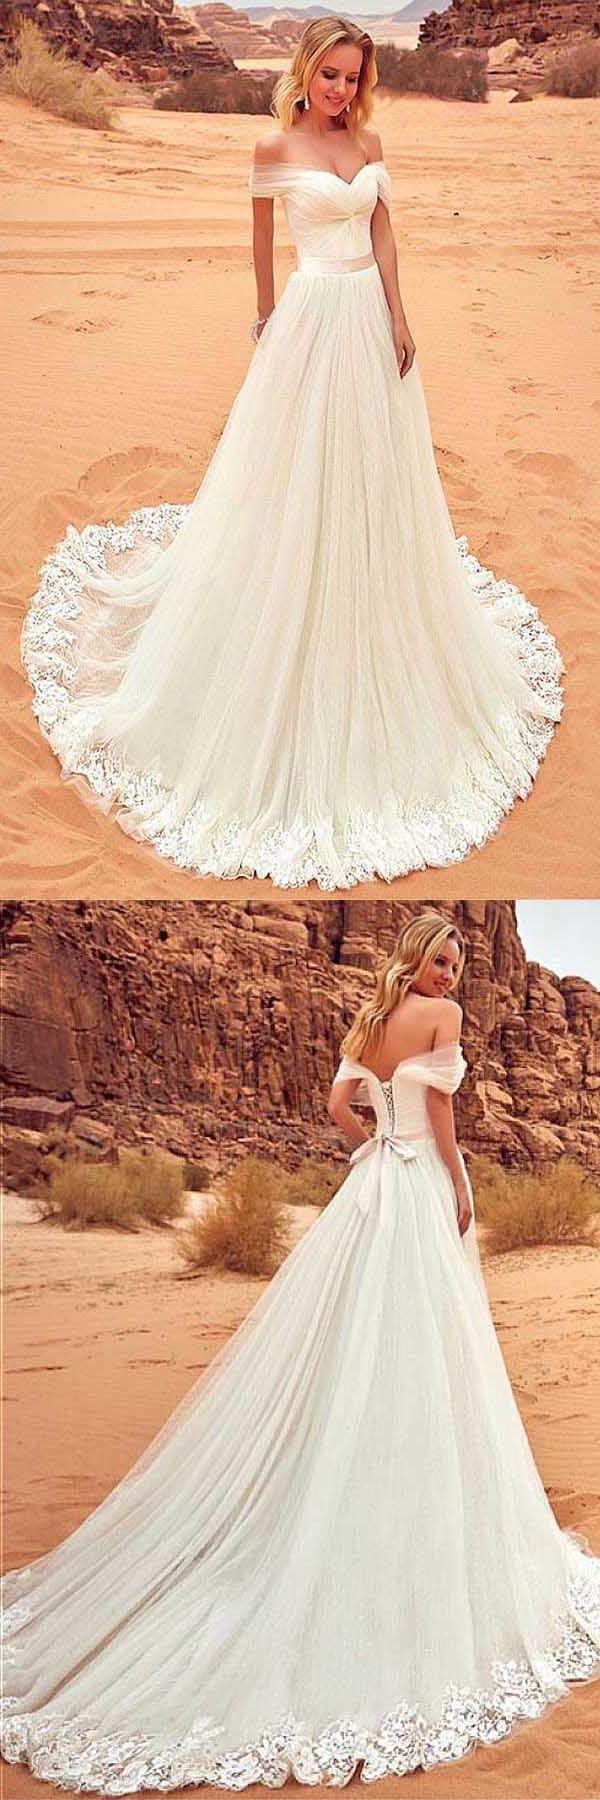 Chinese wedding dress rental los angeles   best Wedding Dresses images on Pinterest